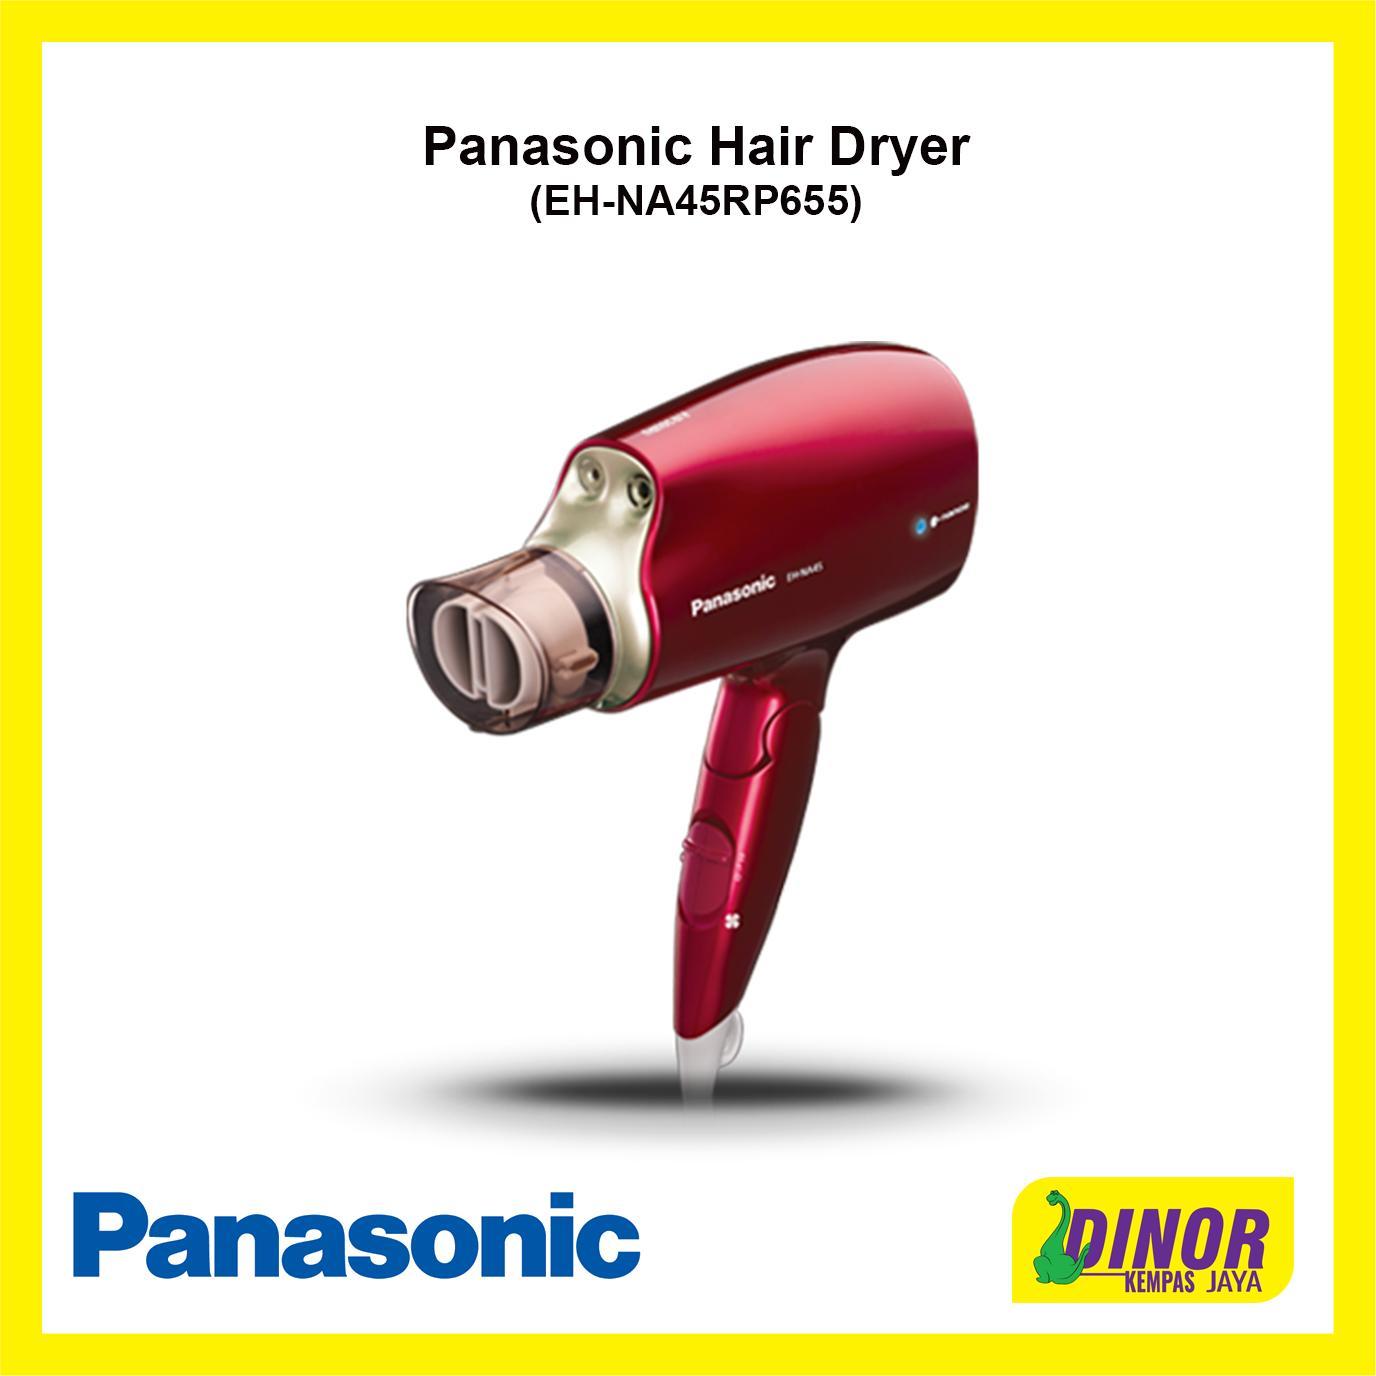 Panasonic Hair Dryer EH-NA45RP655